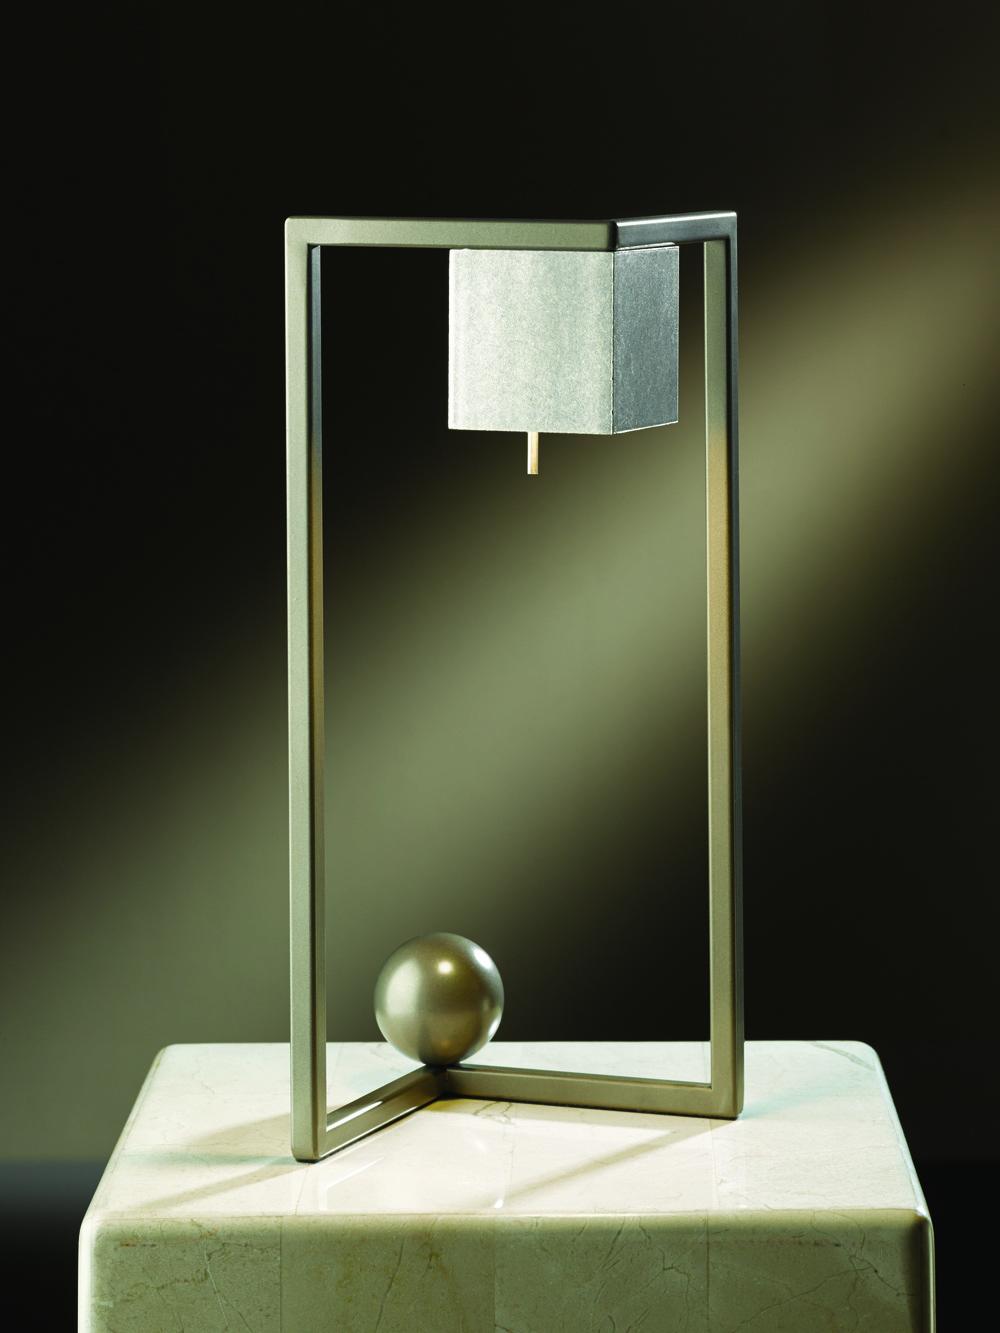 Balance Portable Lamps David Kitts, ASFD; David Martin, ASFD; Zach Pyle, ASFD Hubbardton Forge